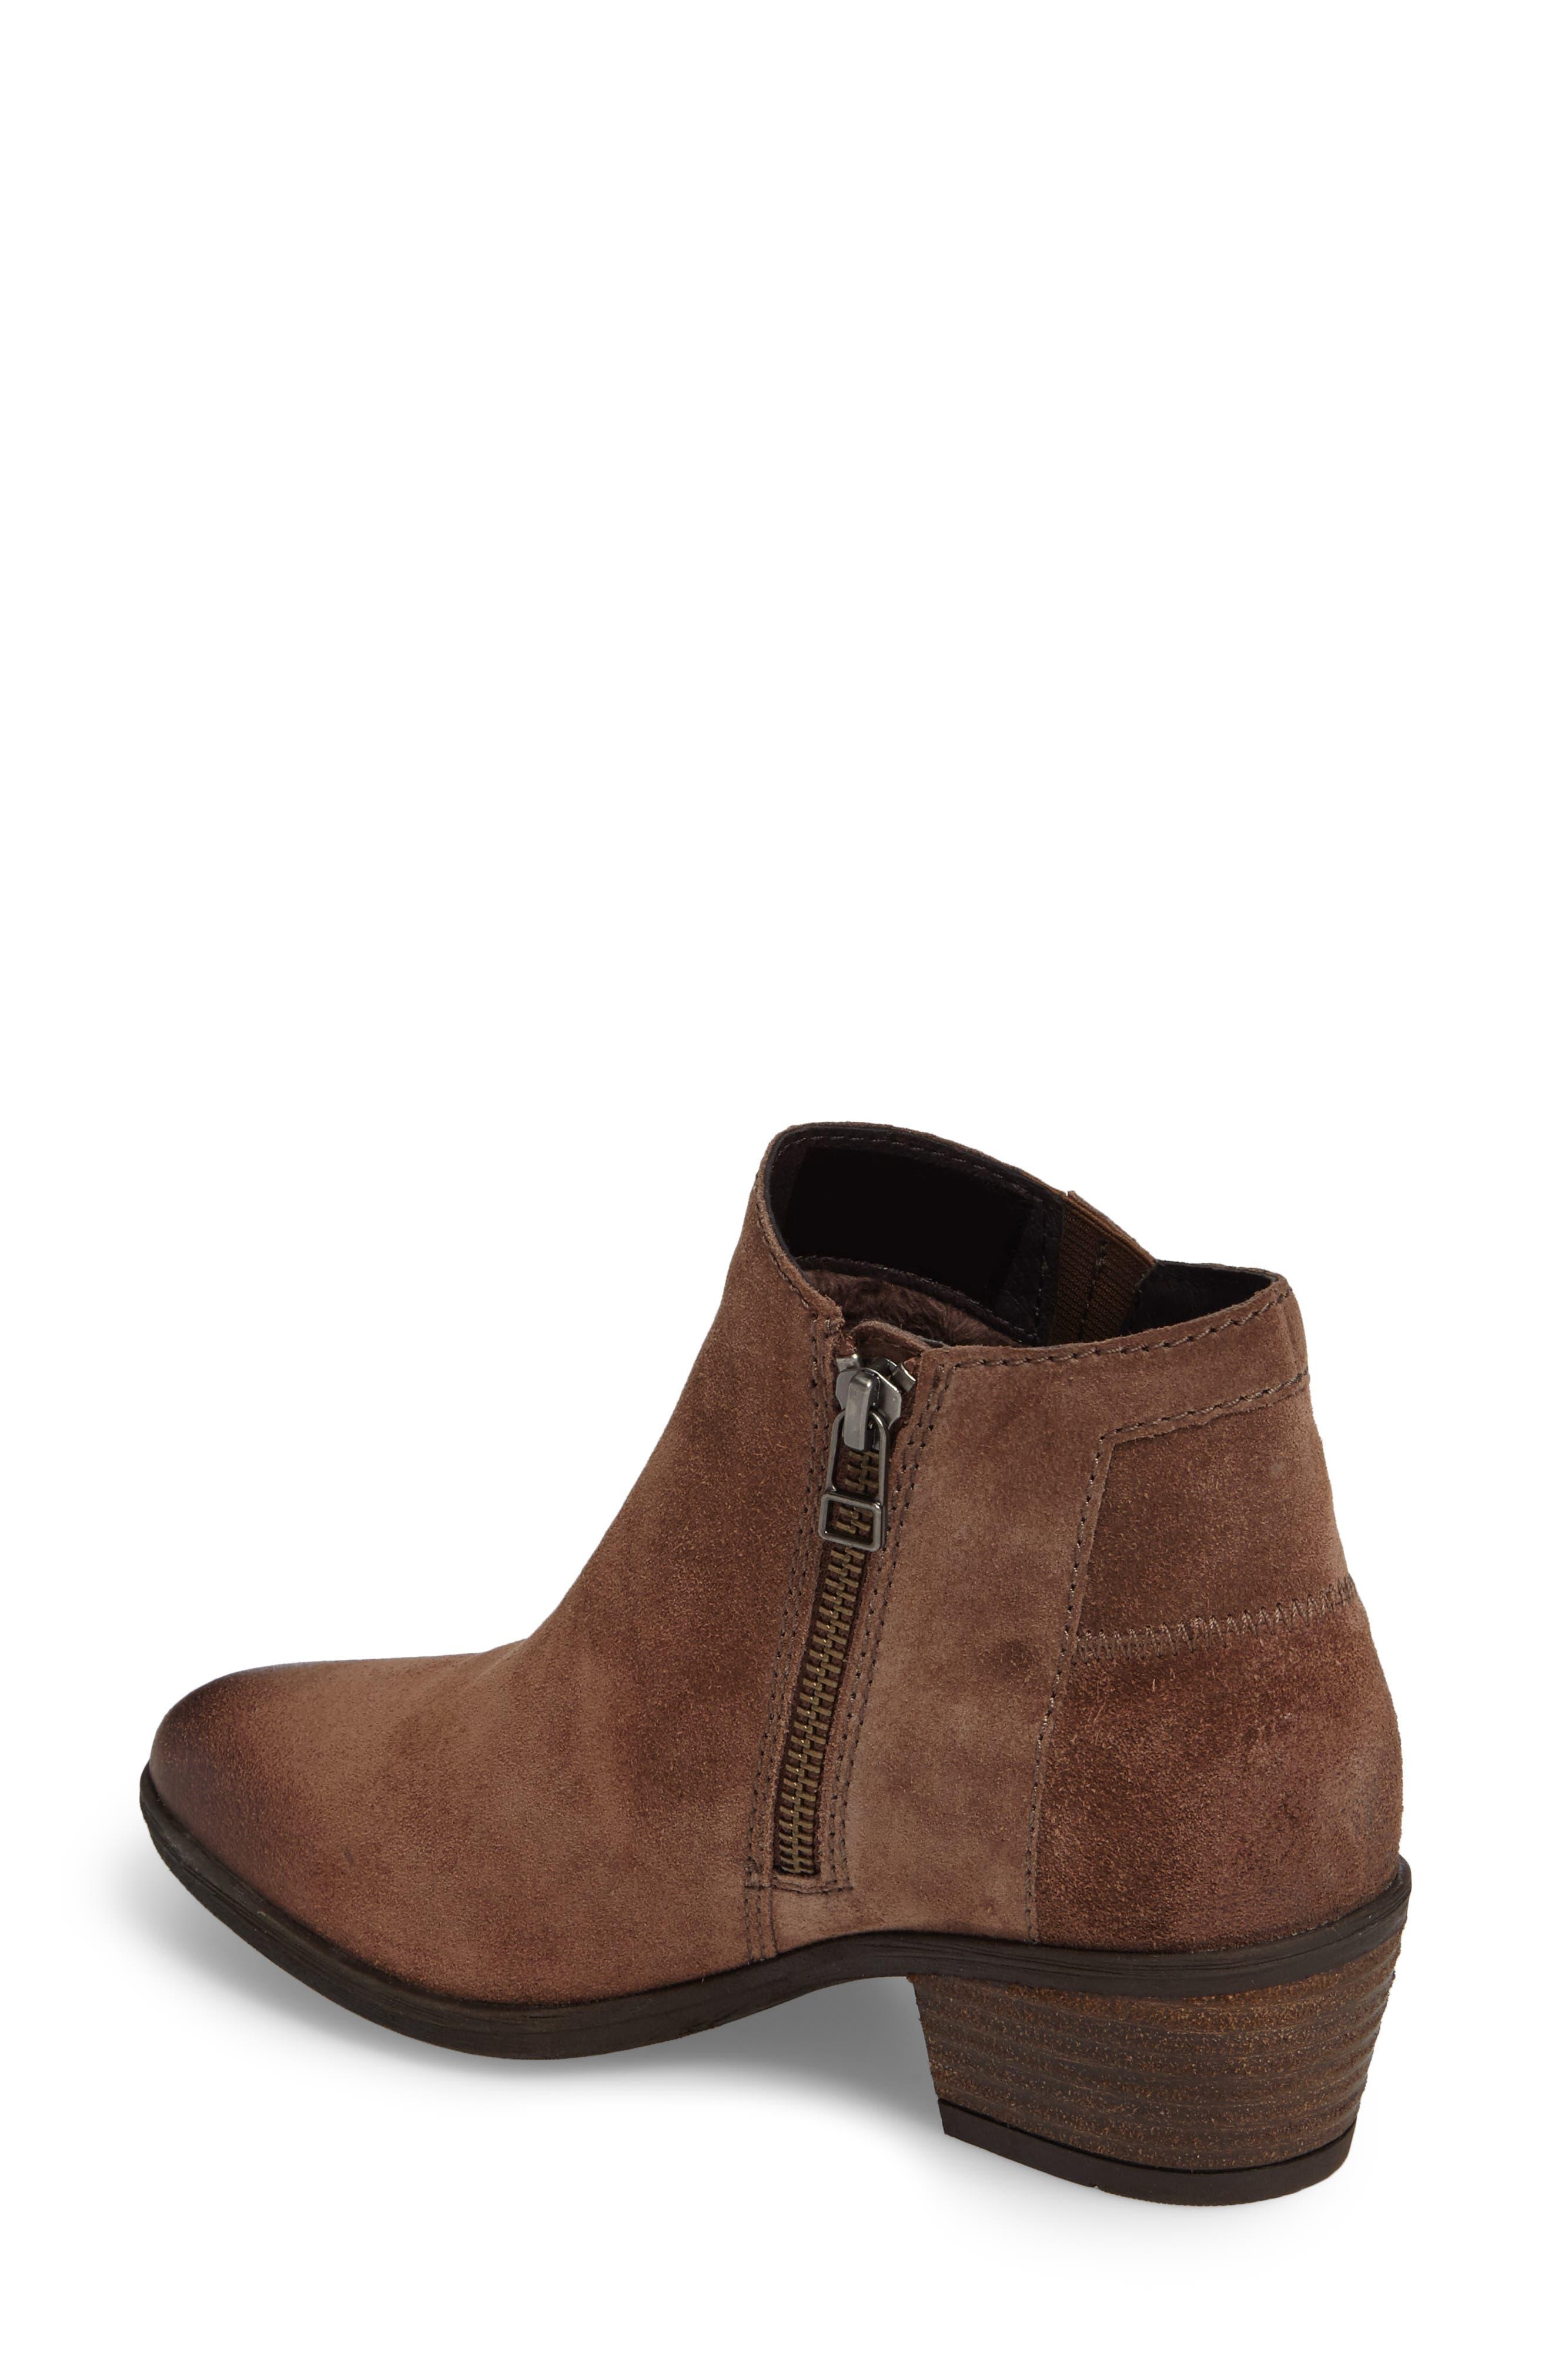 Daphne Bootie,                             Alternate thumbnail 2, color,                             Brown Leather